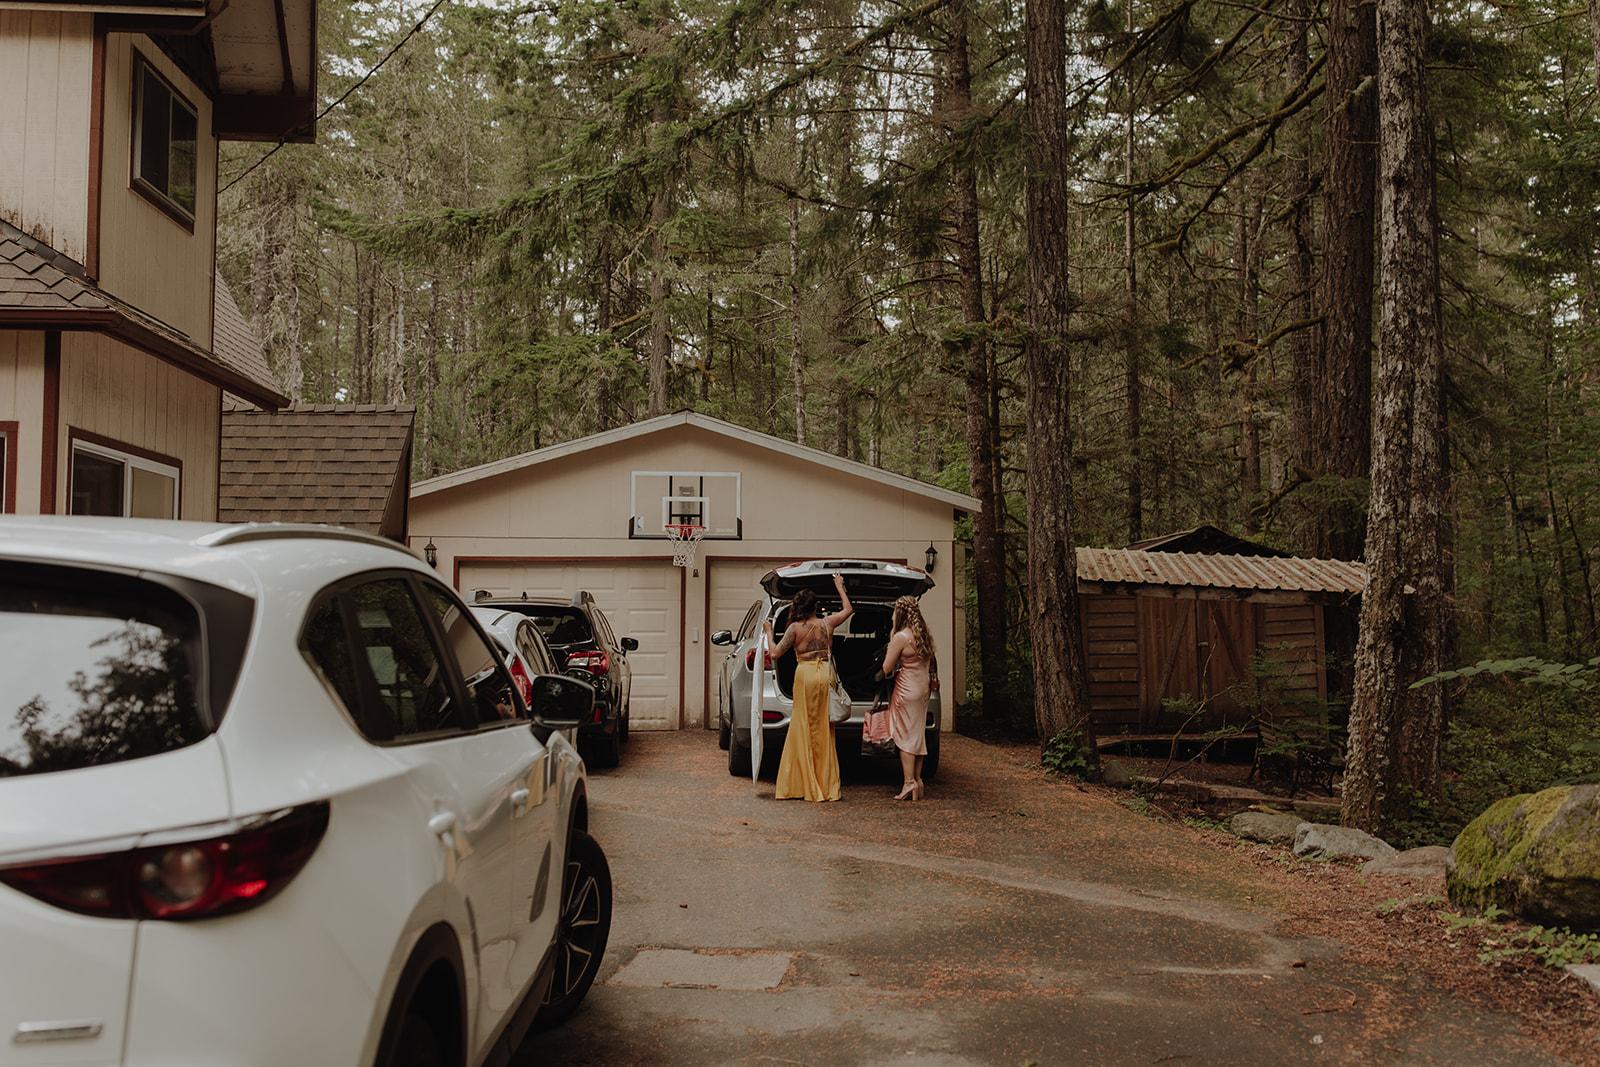 cortney_skye_wedding_june2019-45.jpg